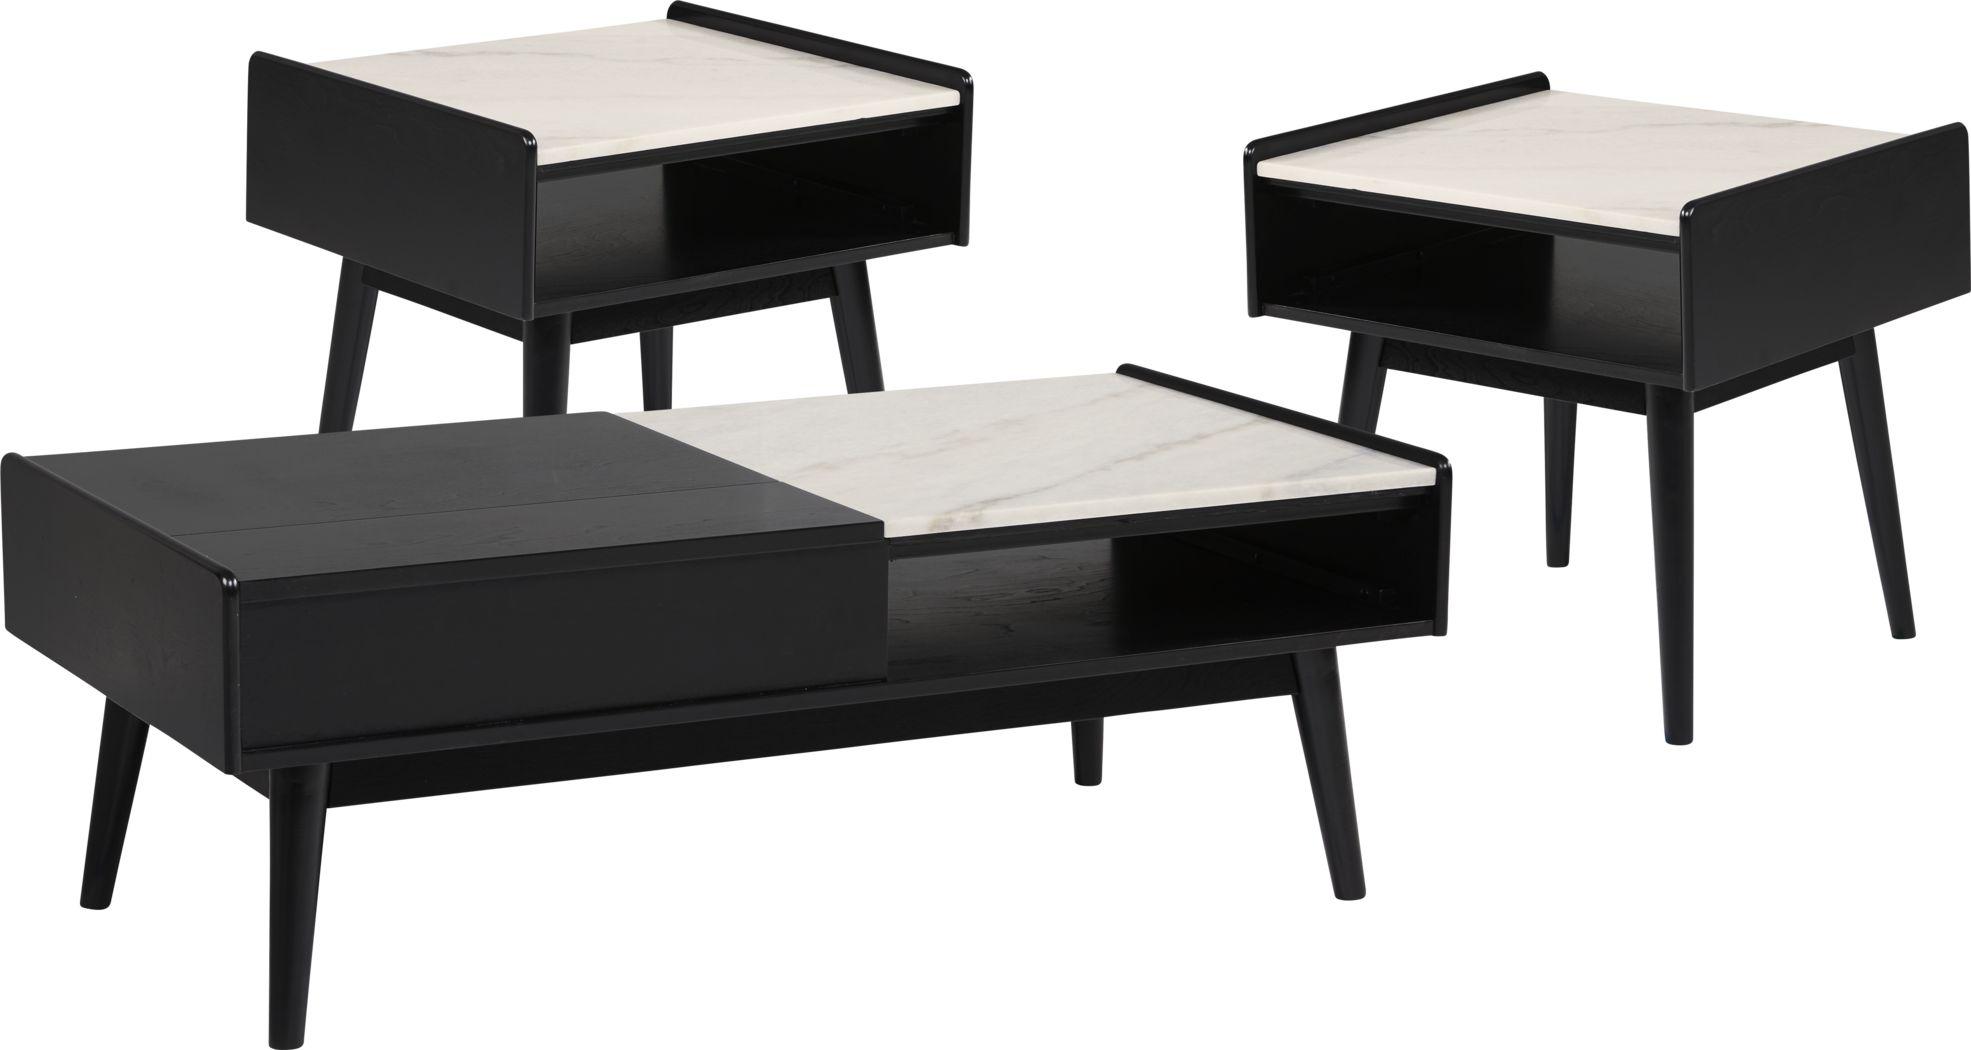 Lanette Black 3 Pc Table Set